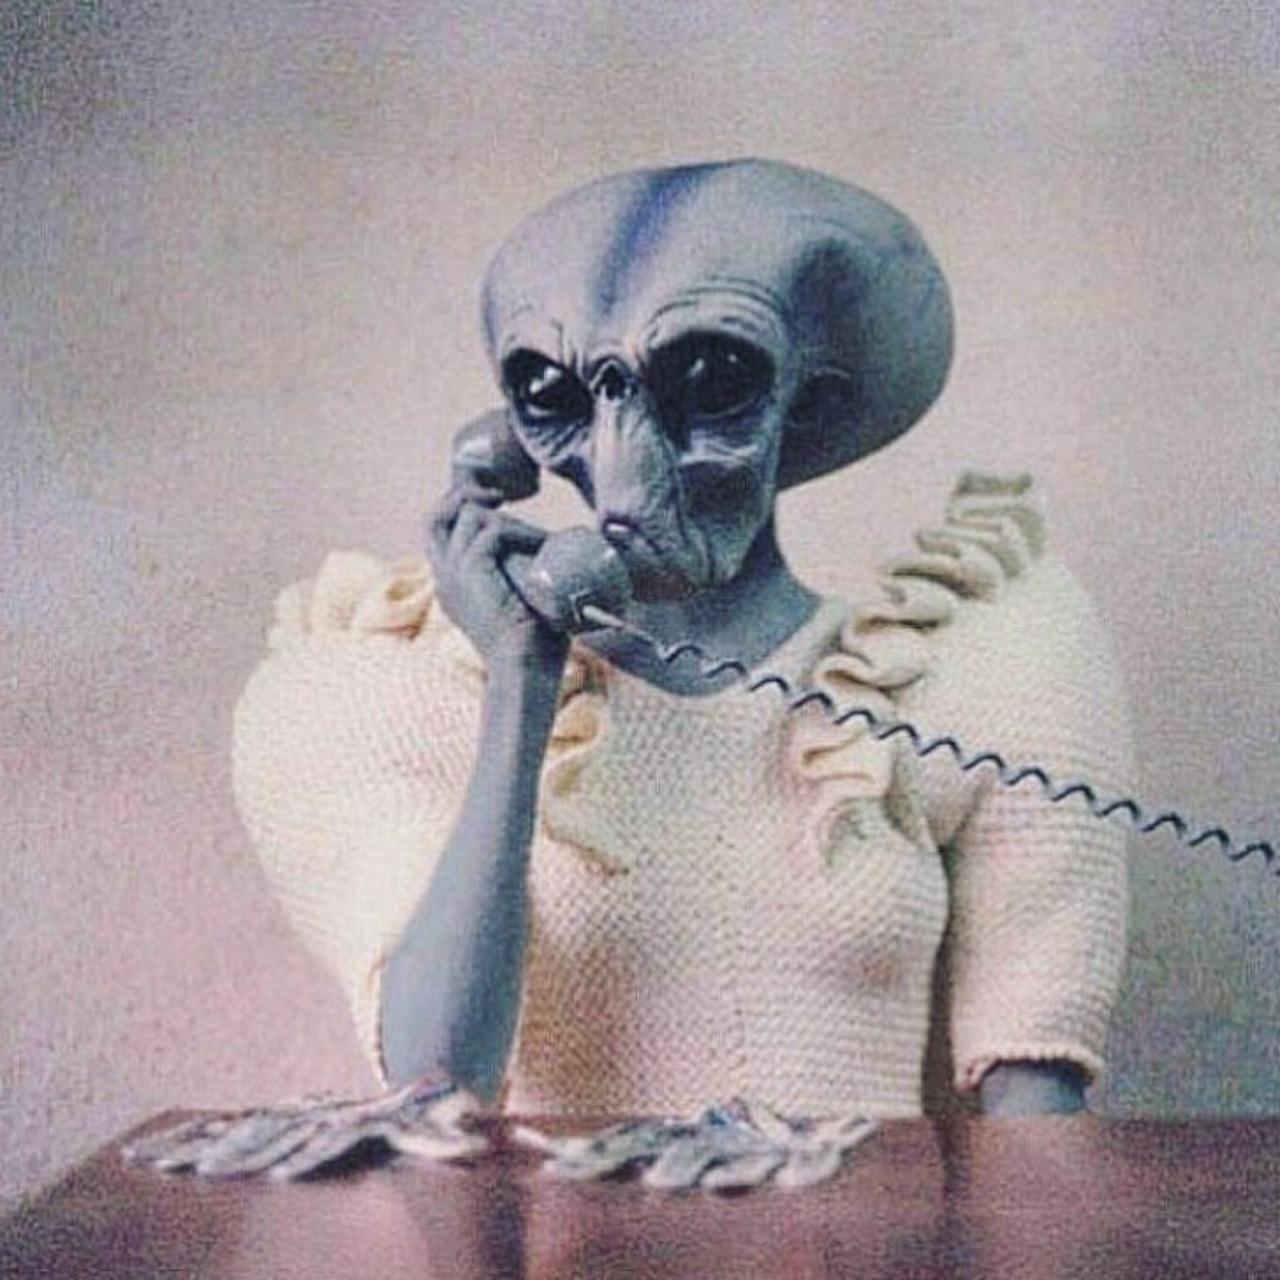 tumblr o0obyxu3zT1qal5kvo1 1280 phone home fantasty   science fiction aliens